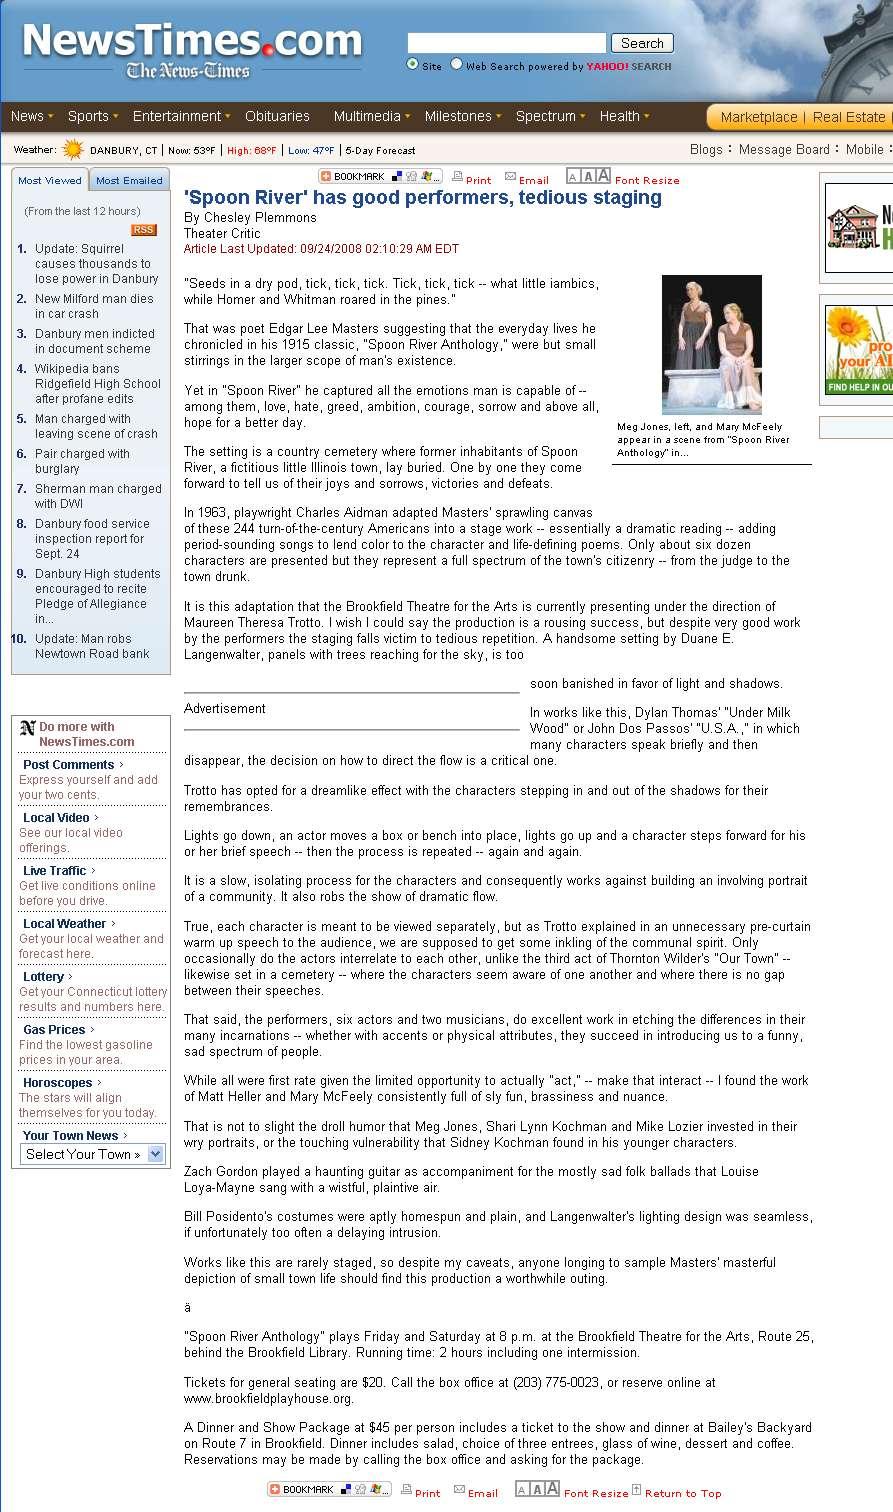 News Times - Spoon River  Sept 08.jpg